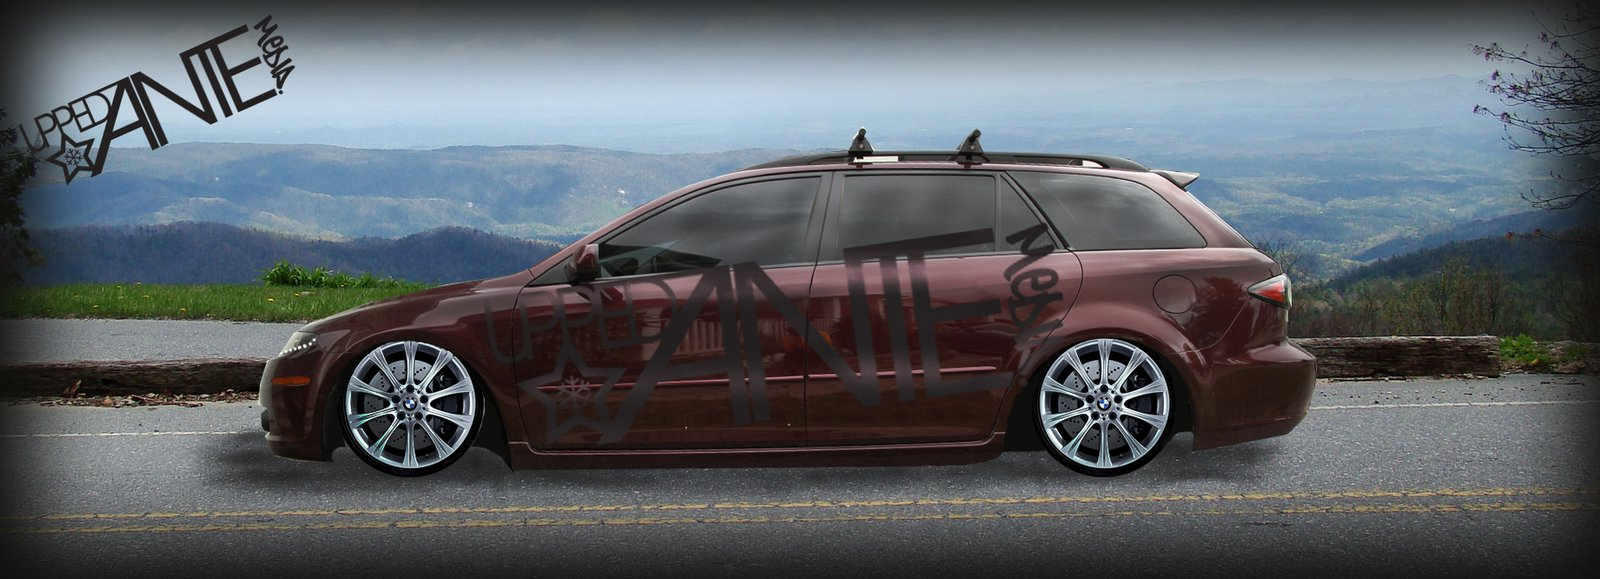 Goal for My Car